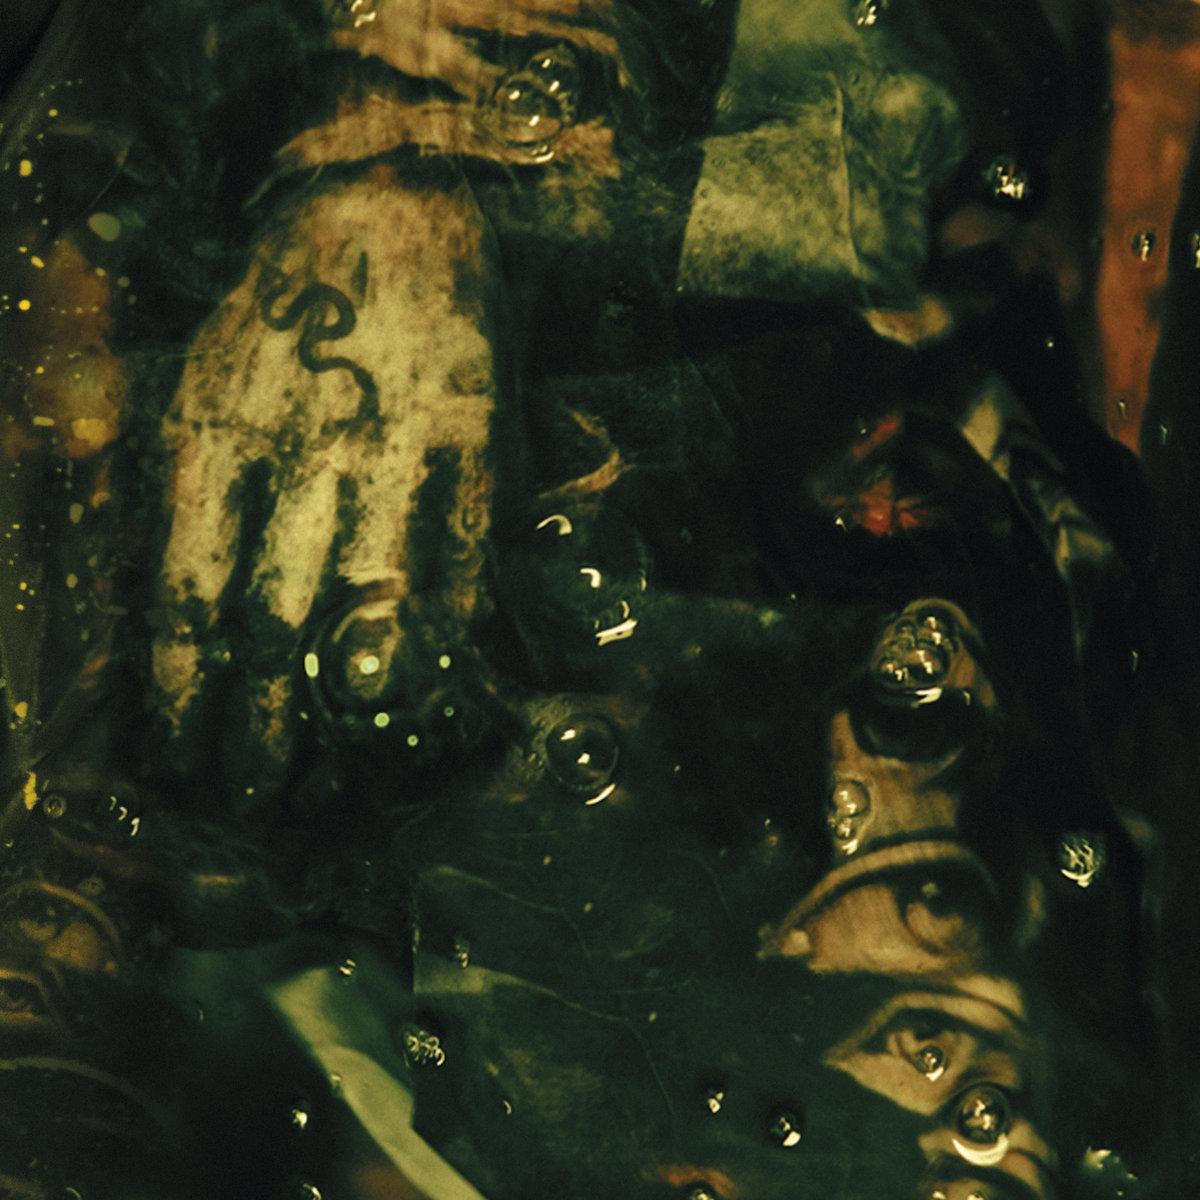 Oranssi Pazuzu - Mesttarin kynsi Review | Angry Metal Guy